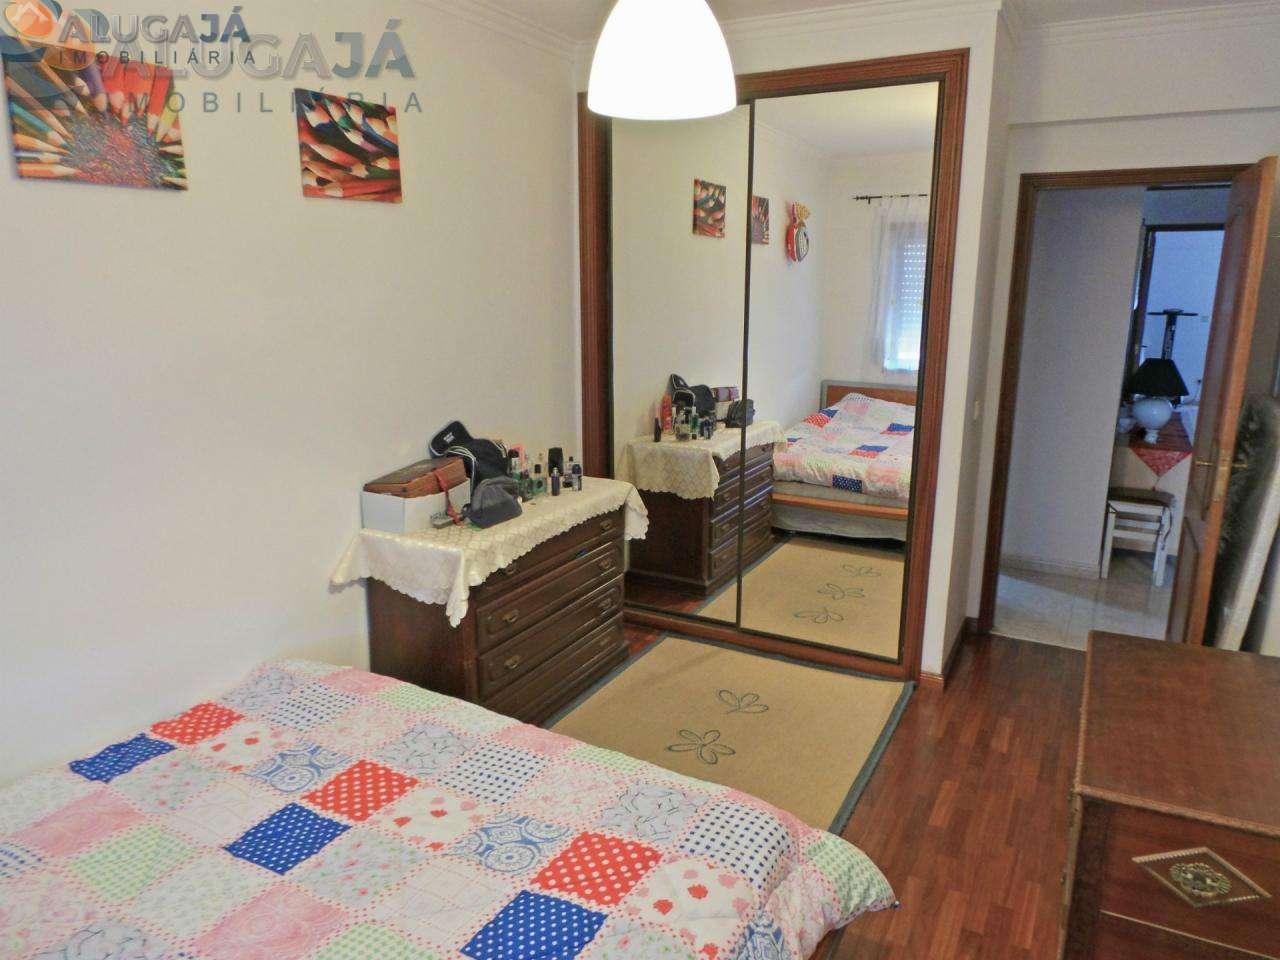 Apartamento para comprar, Vialonga, Vila Franca de Xira, Lisboa - Foto 15